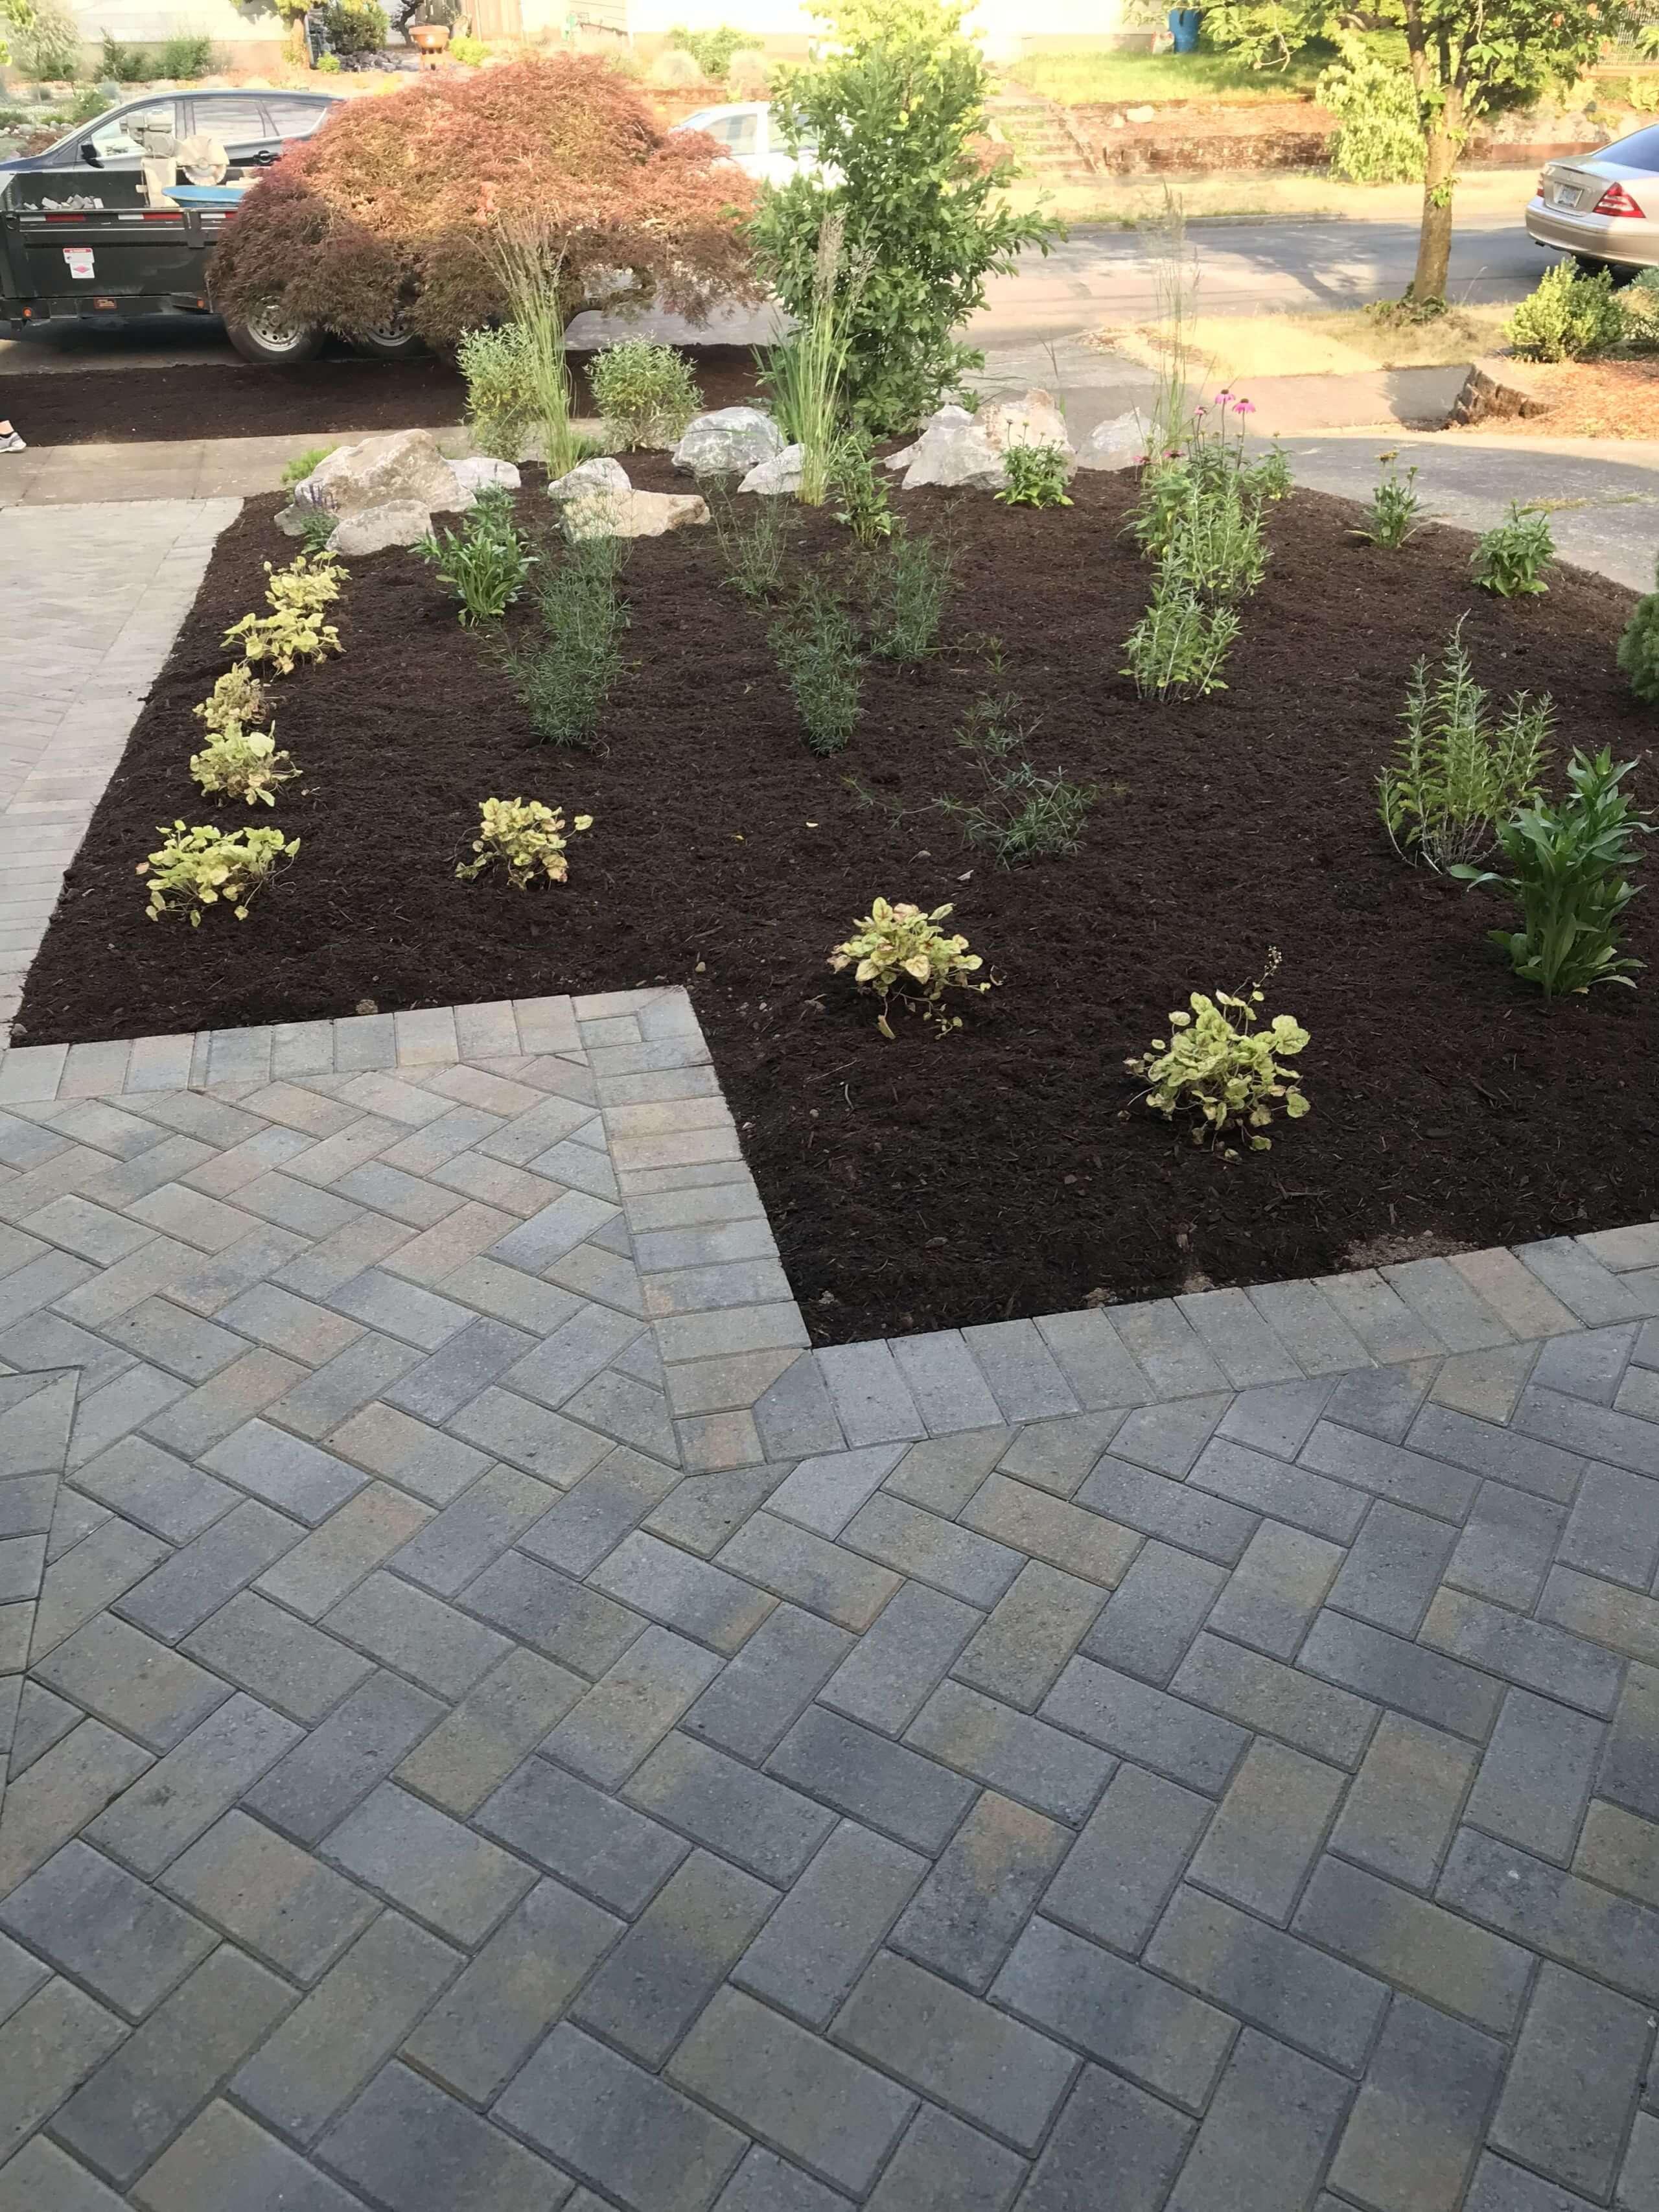 https://shovelandthumb.sfo3.digitaloceanspaces.com/patios walkways/patio 11